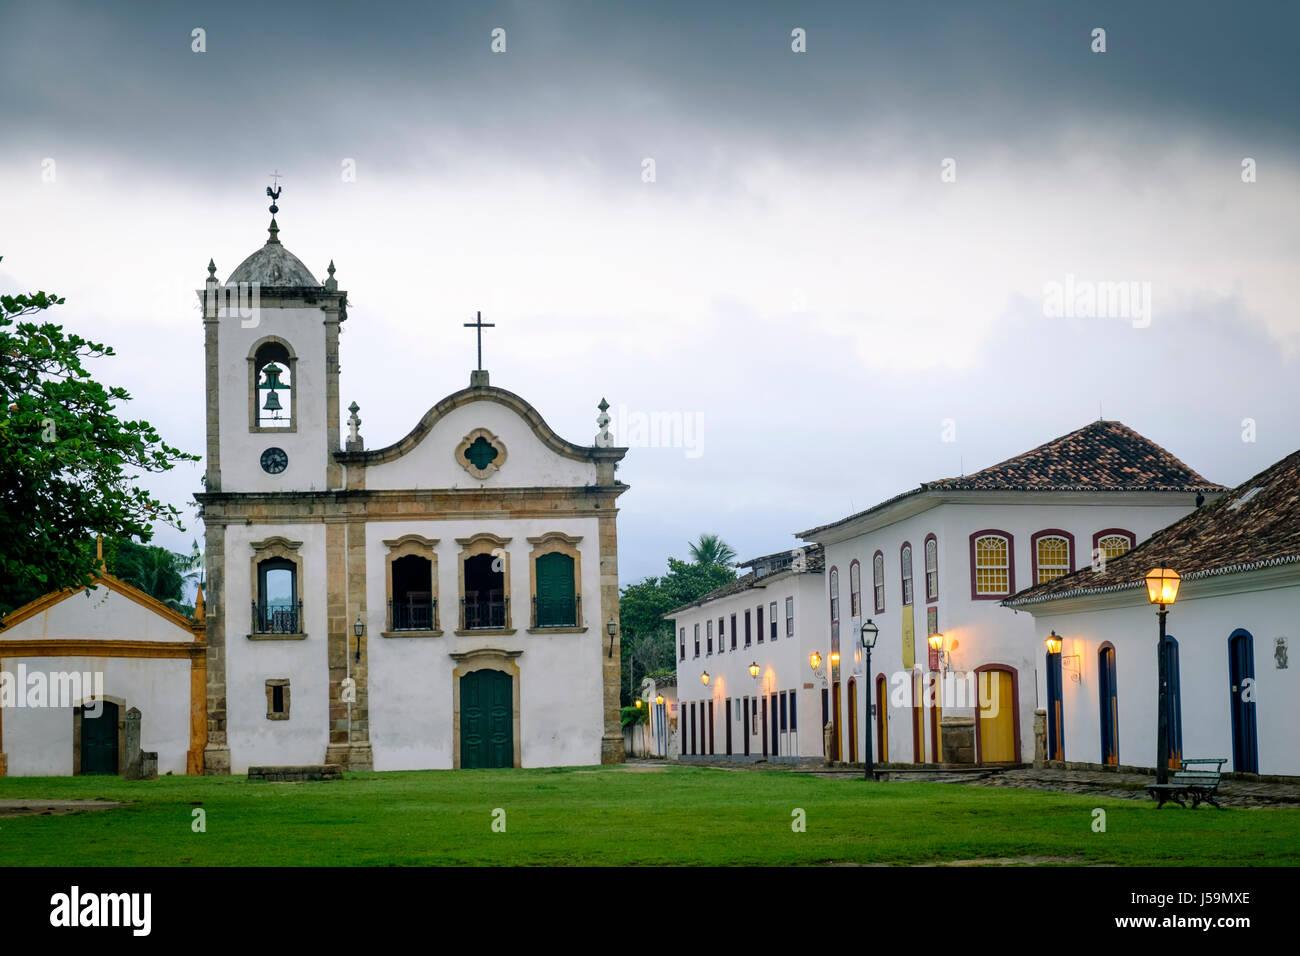 Portugiesischen kolonialen Kirche von Santa Rita, Paraty, Brasilien Stockbild